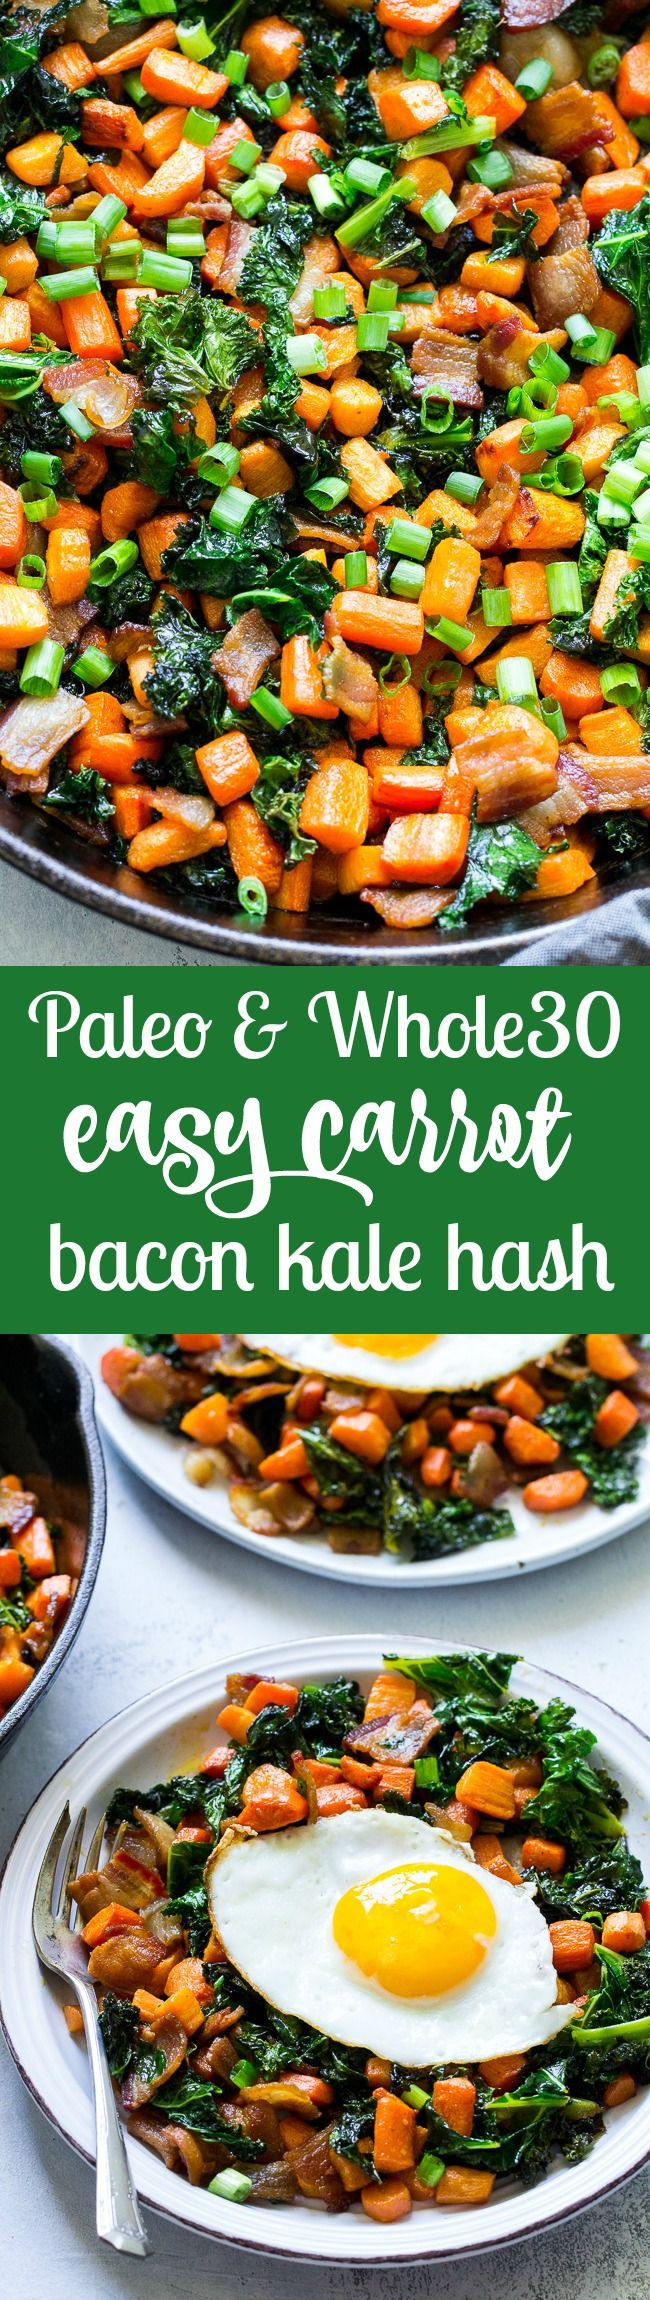 Blue apron kale hash - Roasted Carrot Bacon Kale Hash Paleo Whole30